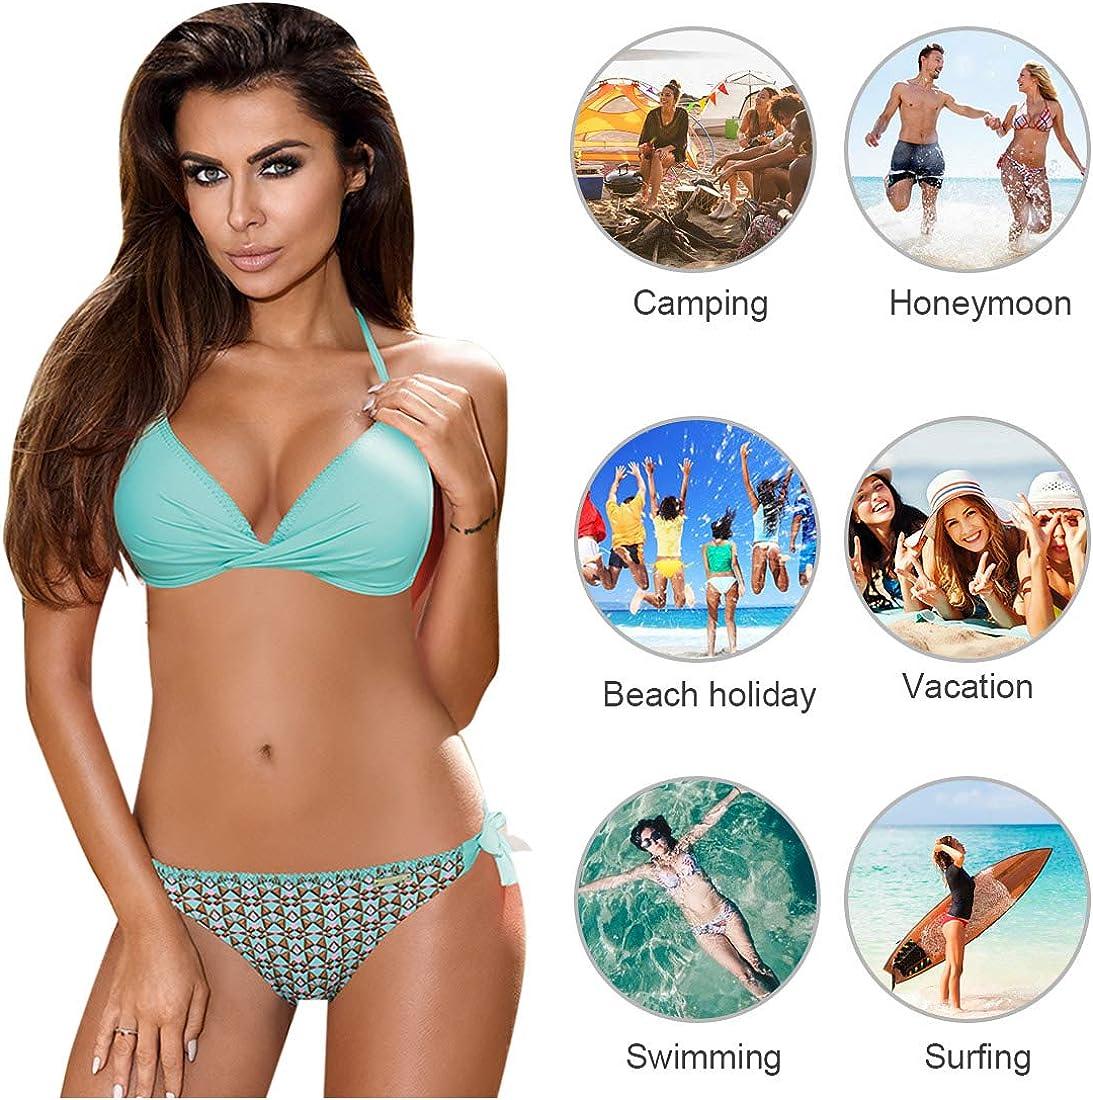 Tuopuda Mujer Multicolor Cabestro Bikini Conjuntos de Cintura Baja Ajustable Bikini Inferior Impresa Raya Playa Traje de Ba/ño